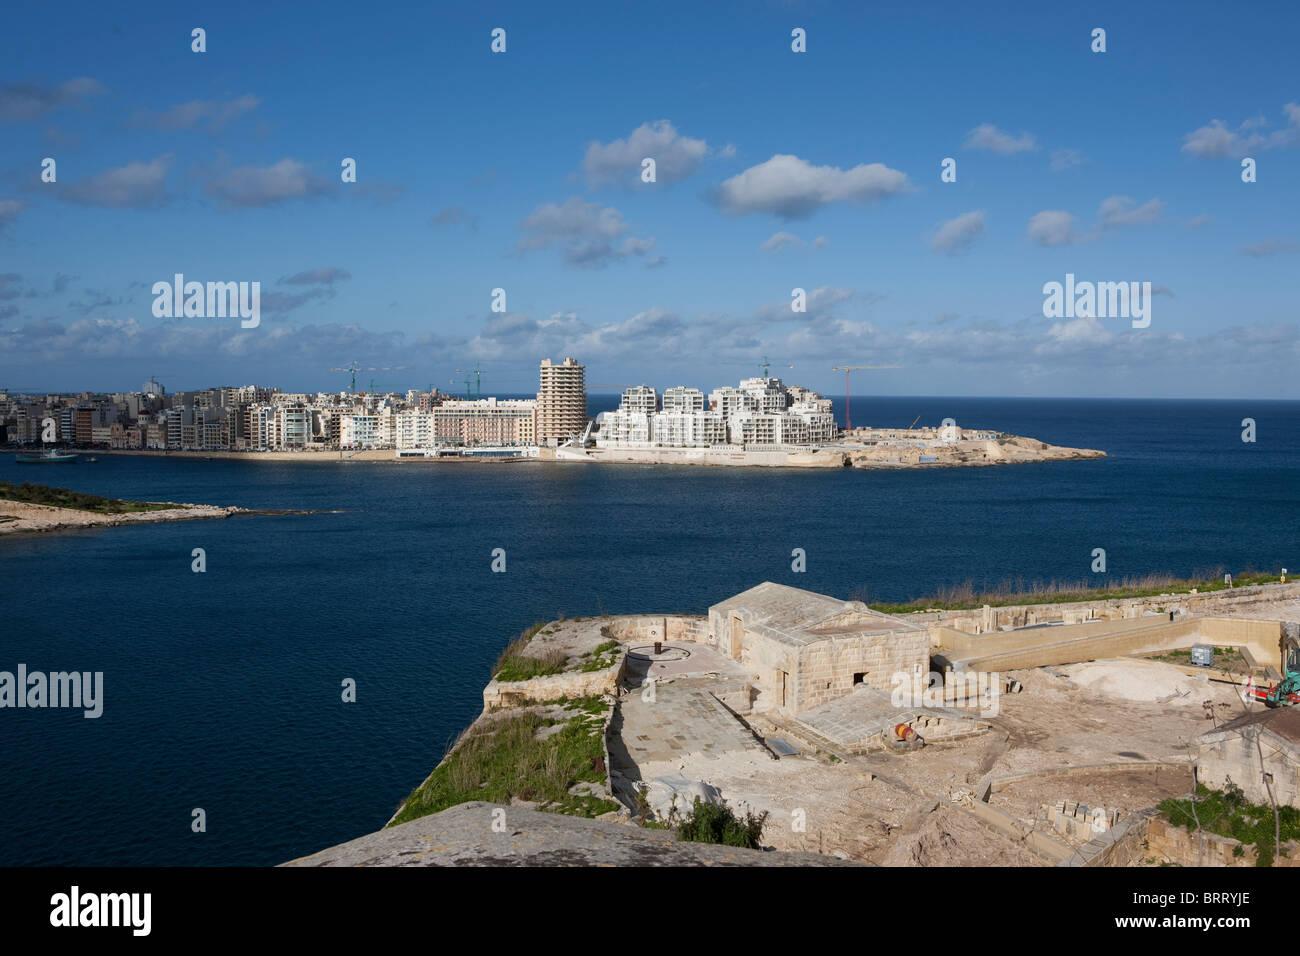 View of Marsamxett Harbour and Sliema Beach from Valletta, Sliema Creek, Valletta, Malta, Europe - Stock Image